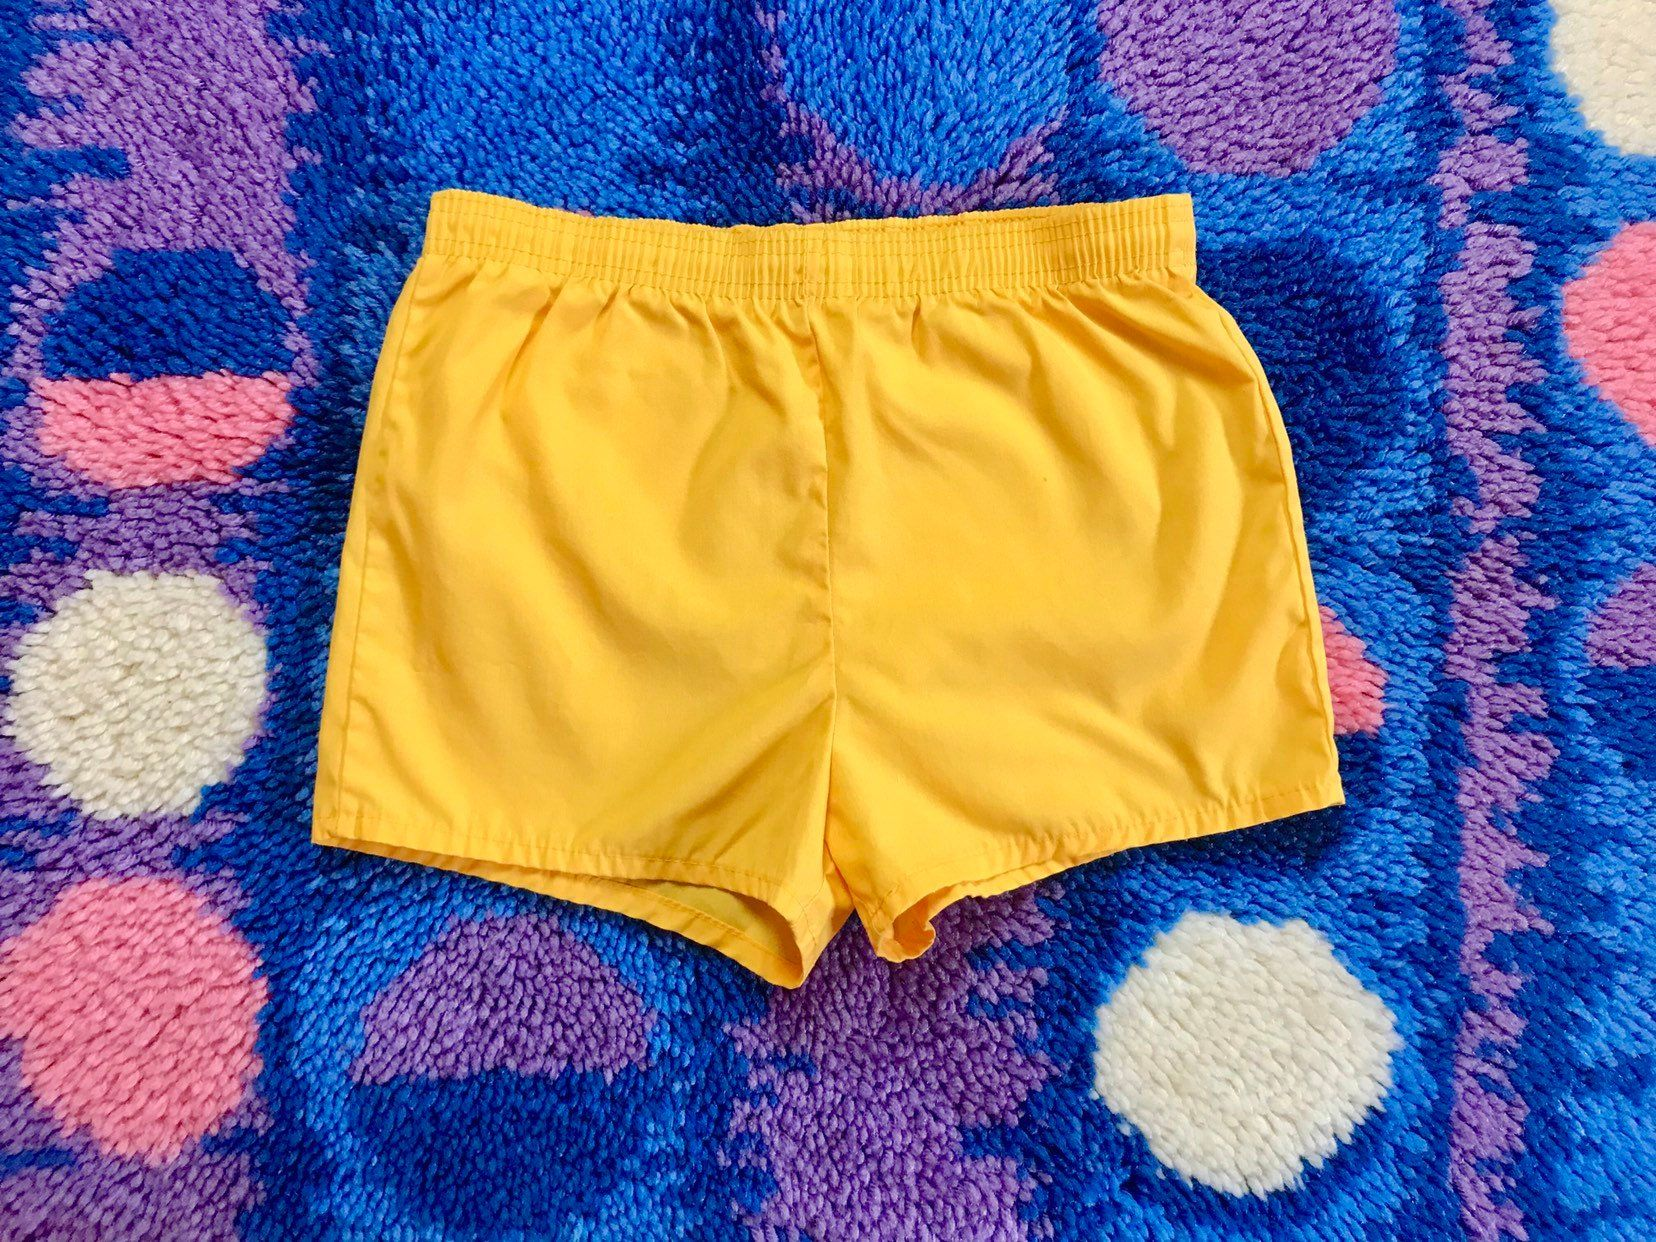 ff94b91d8f041 Vintage 1970s yellow swim trunks men's XS/S retro 70s 80s short shorts hot  pants